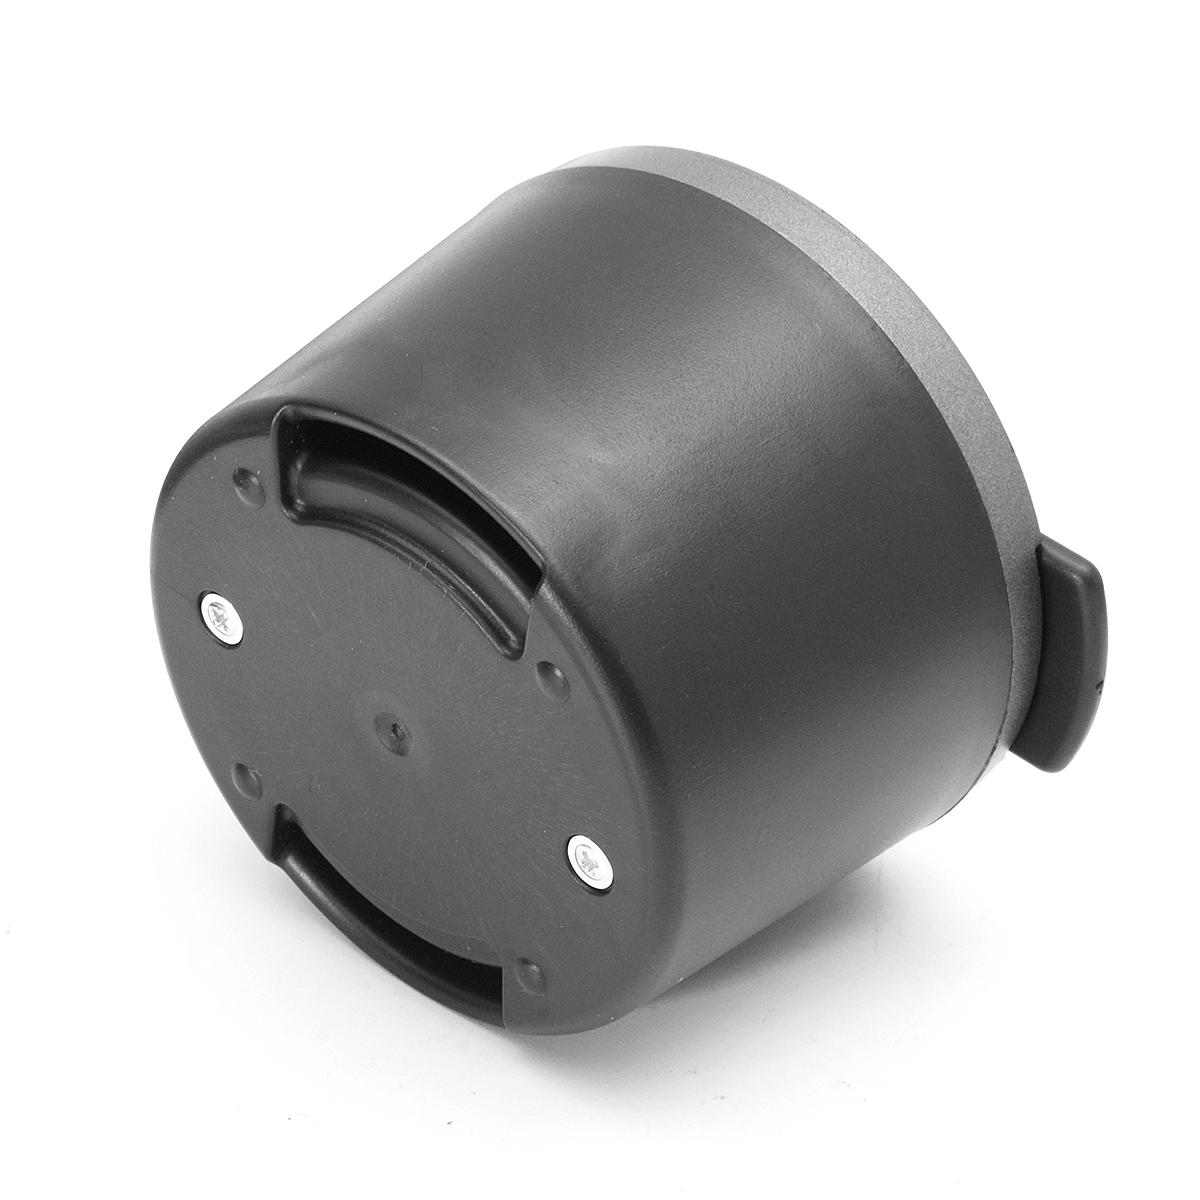 Black Car Auto Portable Smoking Cup Ashtray Holder